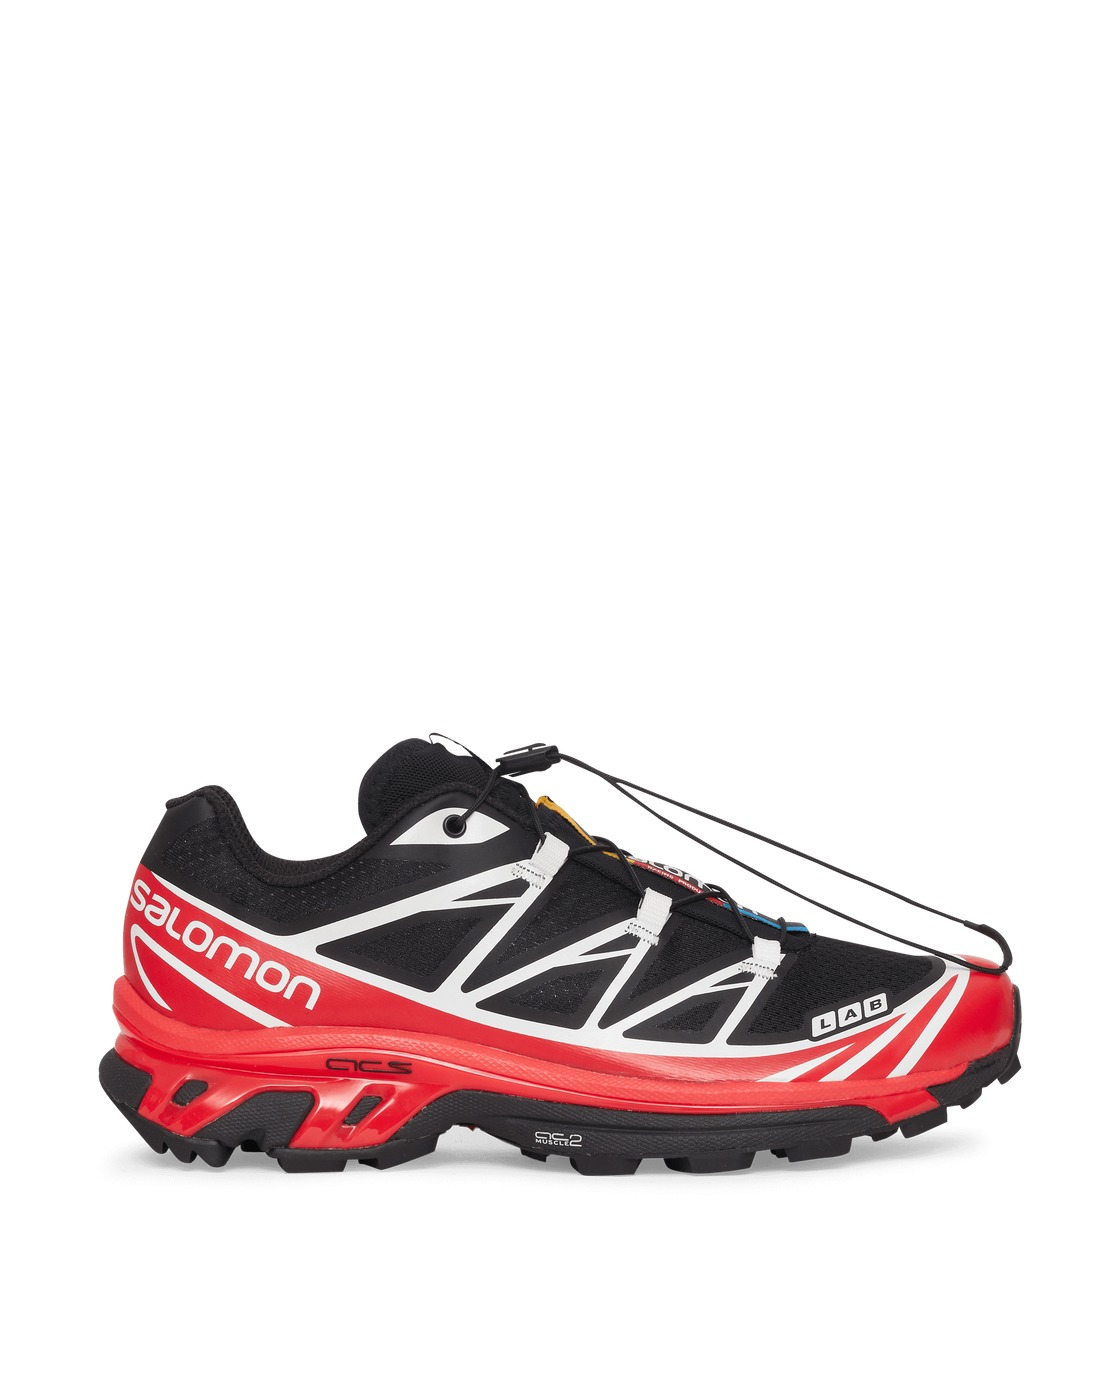 Photo: Salomon Xt 6 Advanced Sneakers Black/Racing Red